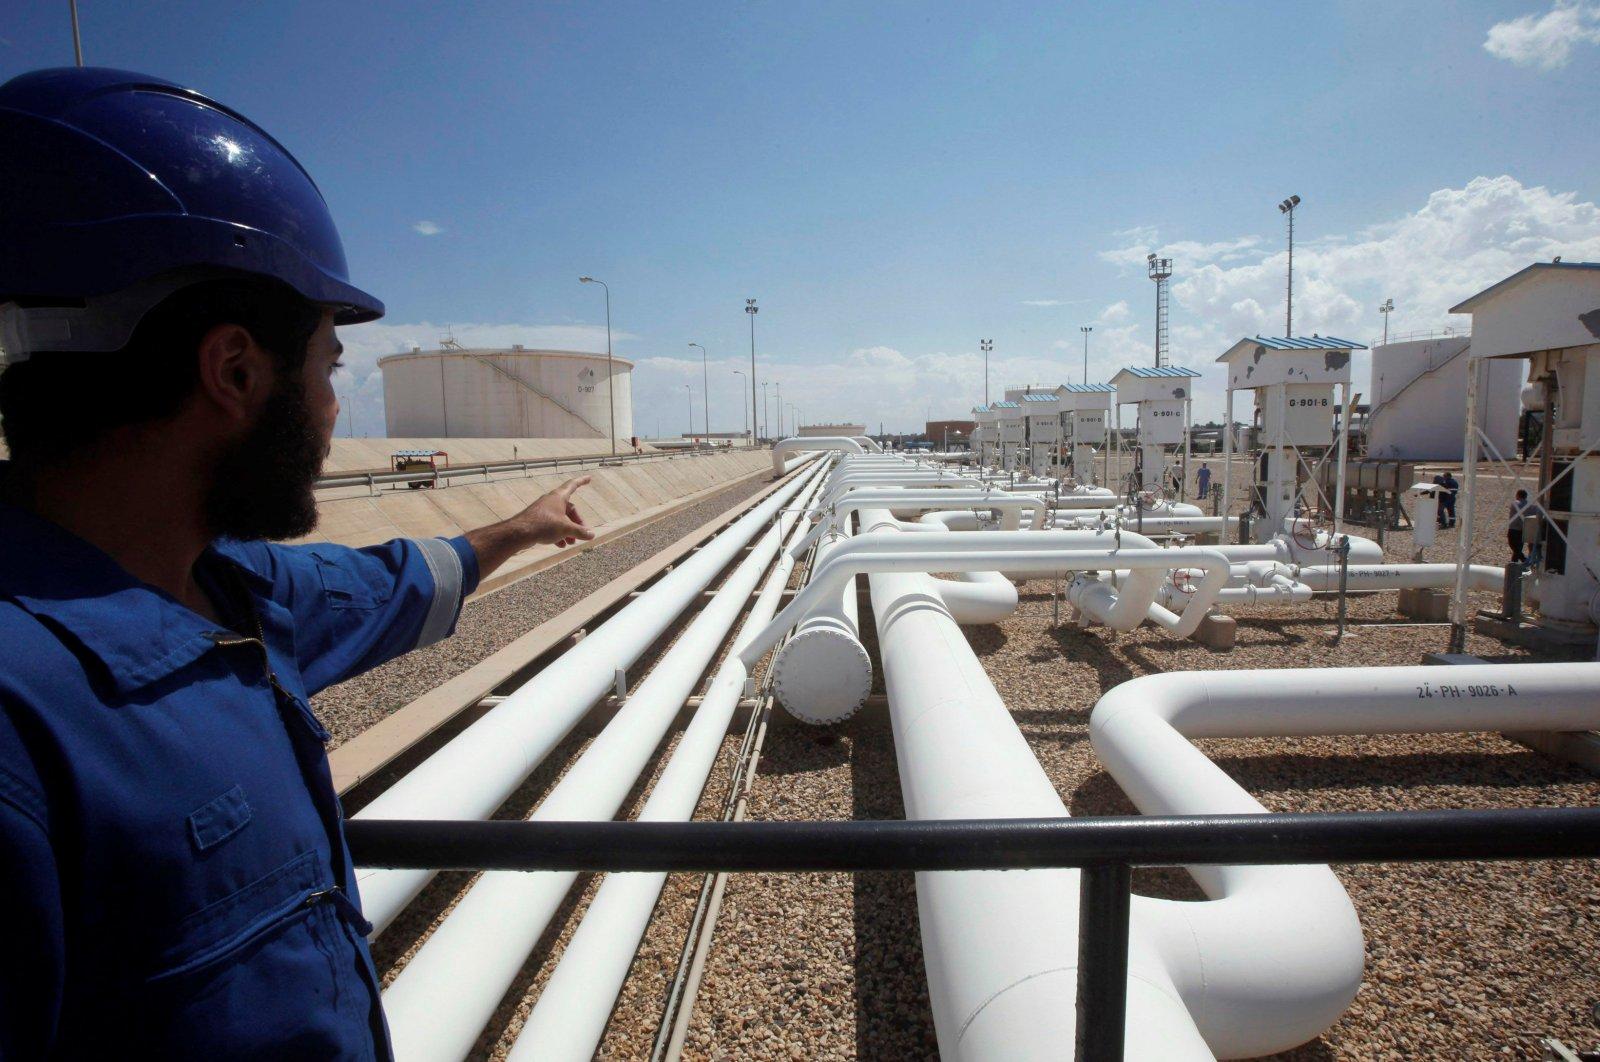 A worker gestures toward pipelines at the Zawiya Oil Refinery, in Libya, Aug. 22, 2013. (Reuters Photo)